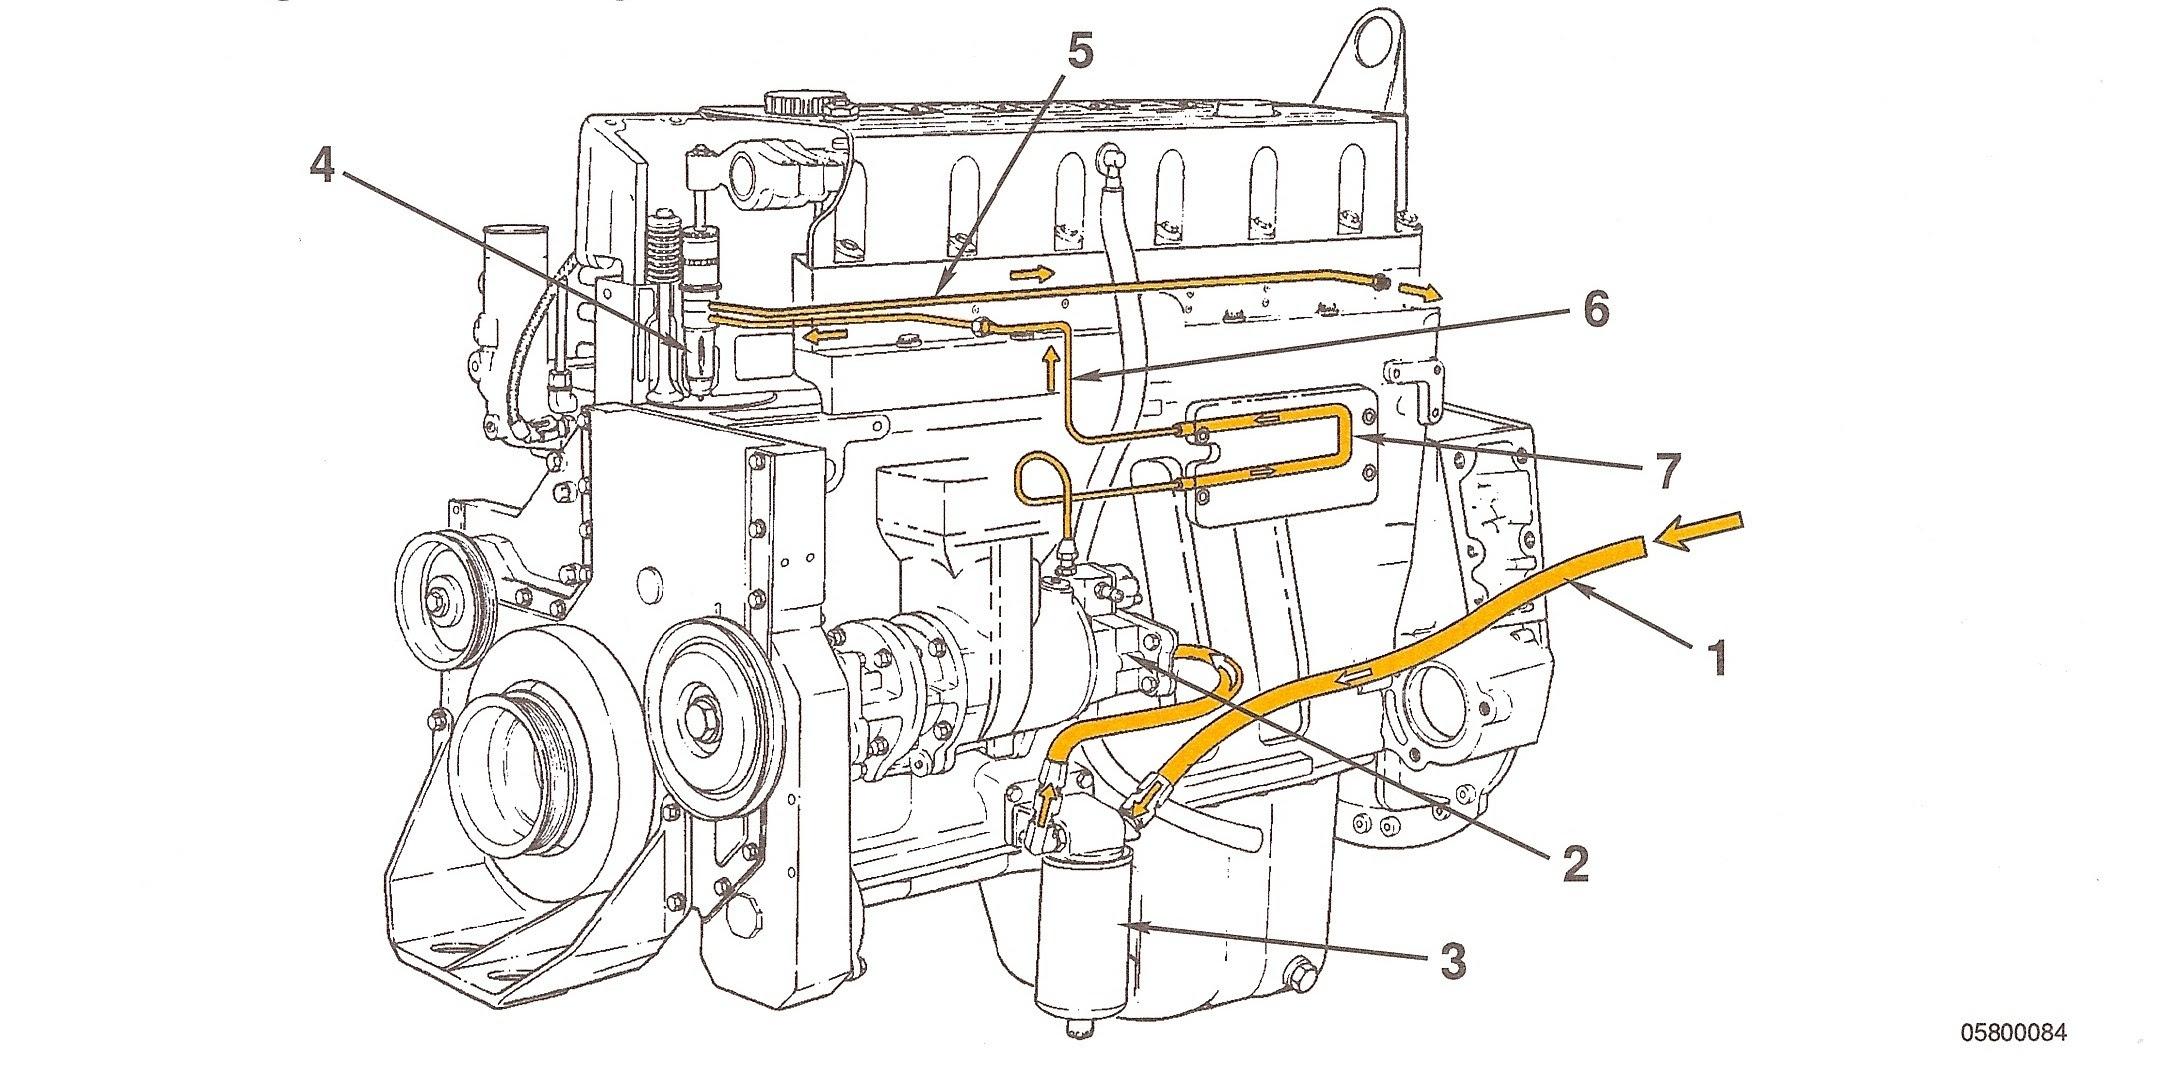 1992 Cummins Fuel System Diagram 1978 Bronco Fuse Box Begeboy Wiring Diagram Source